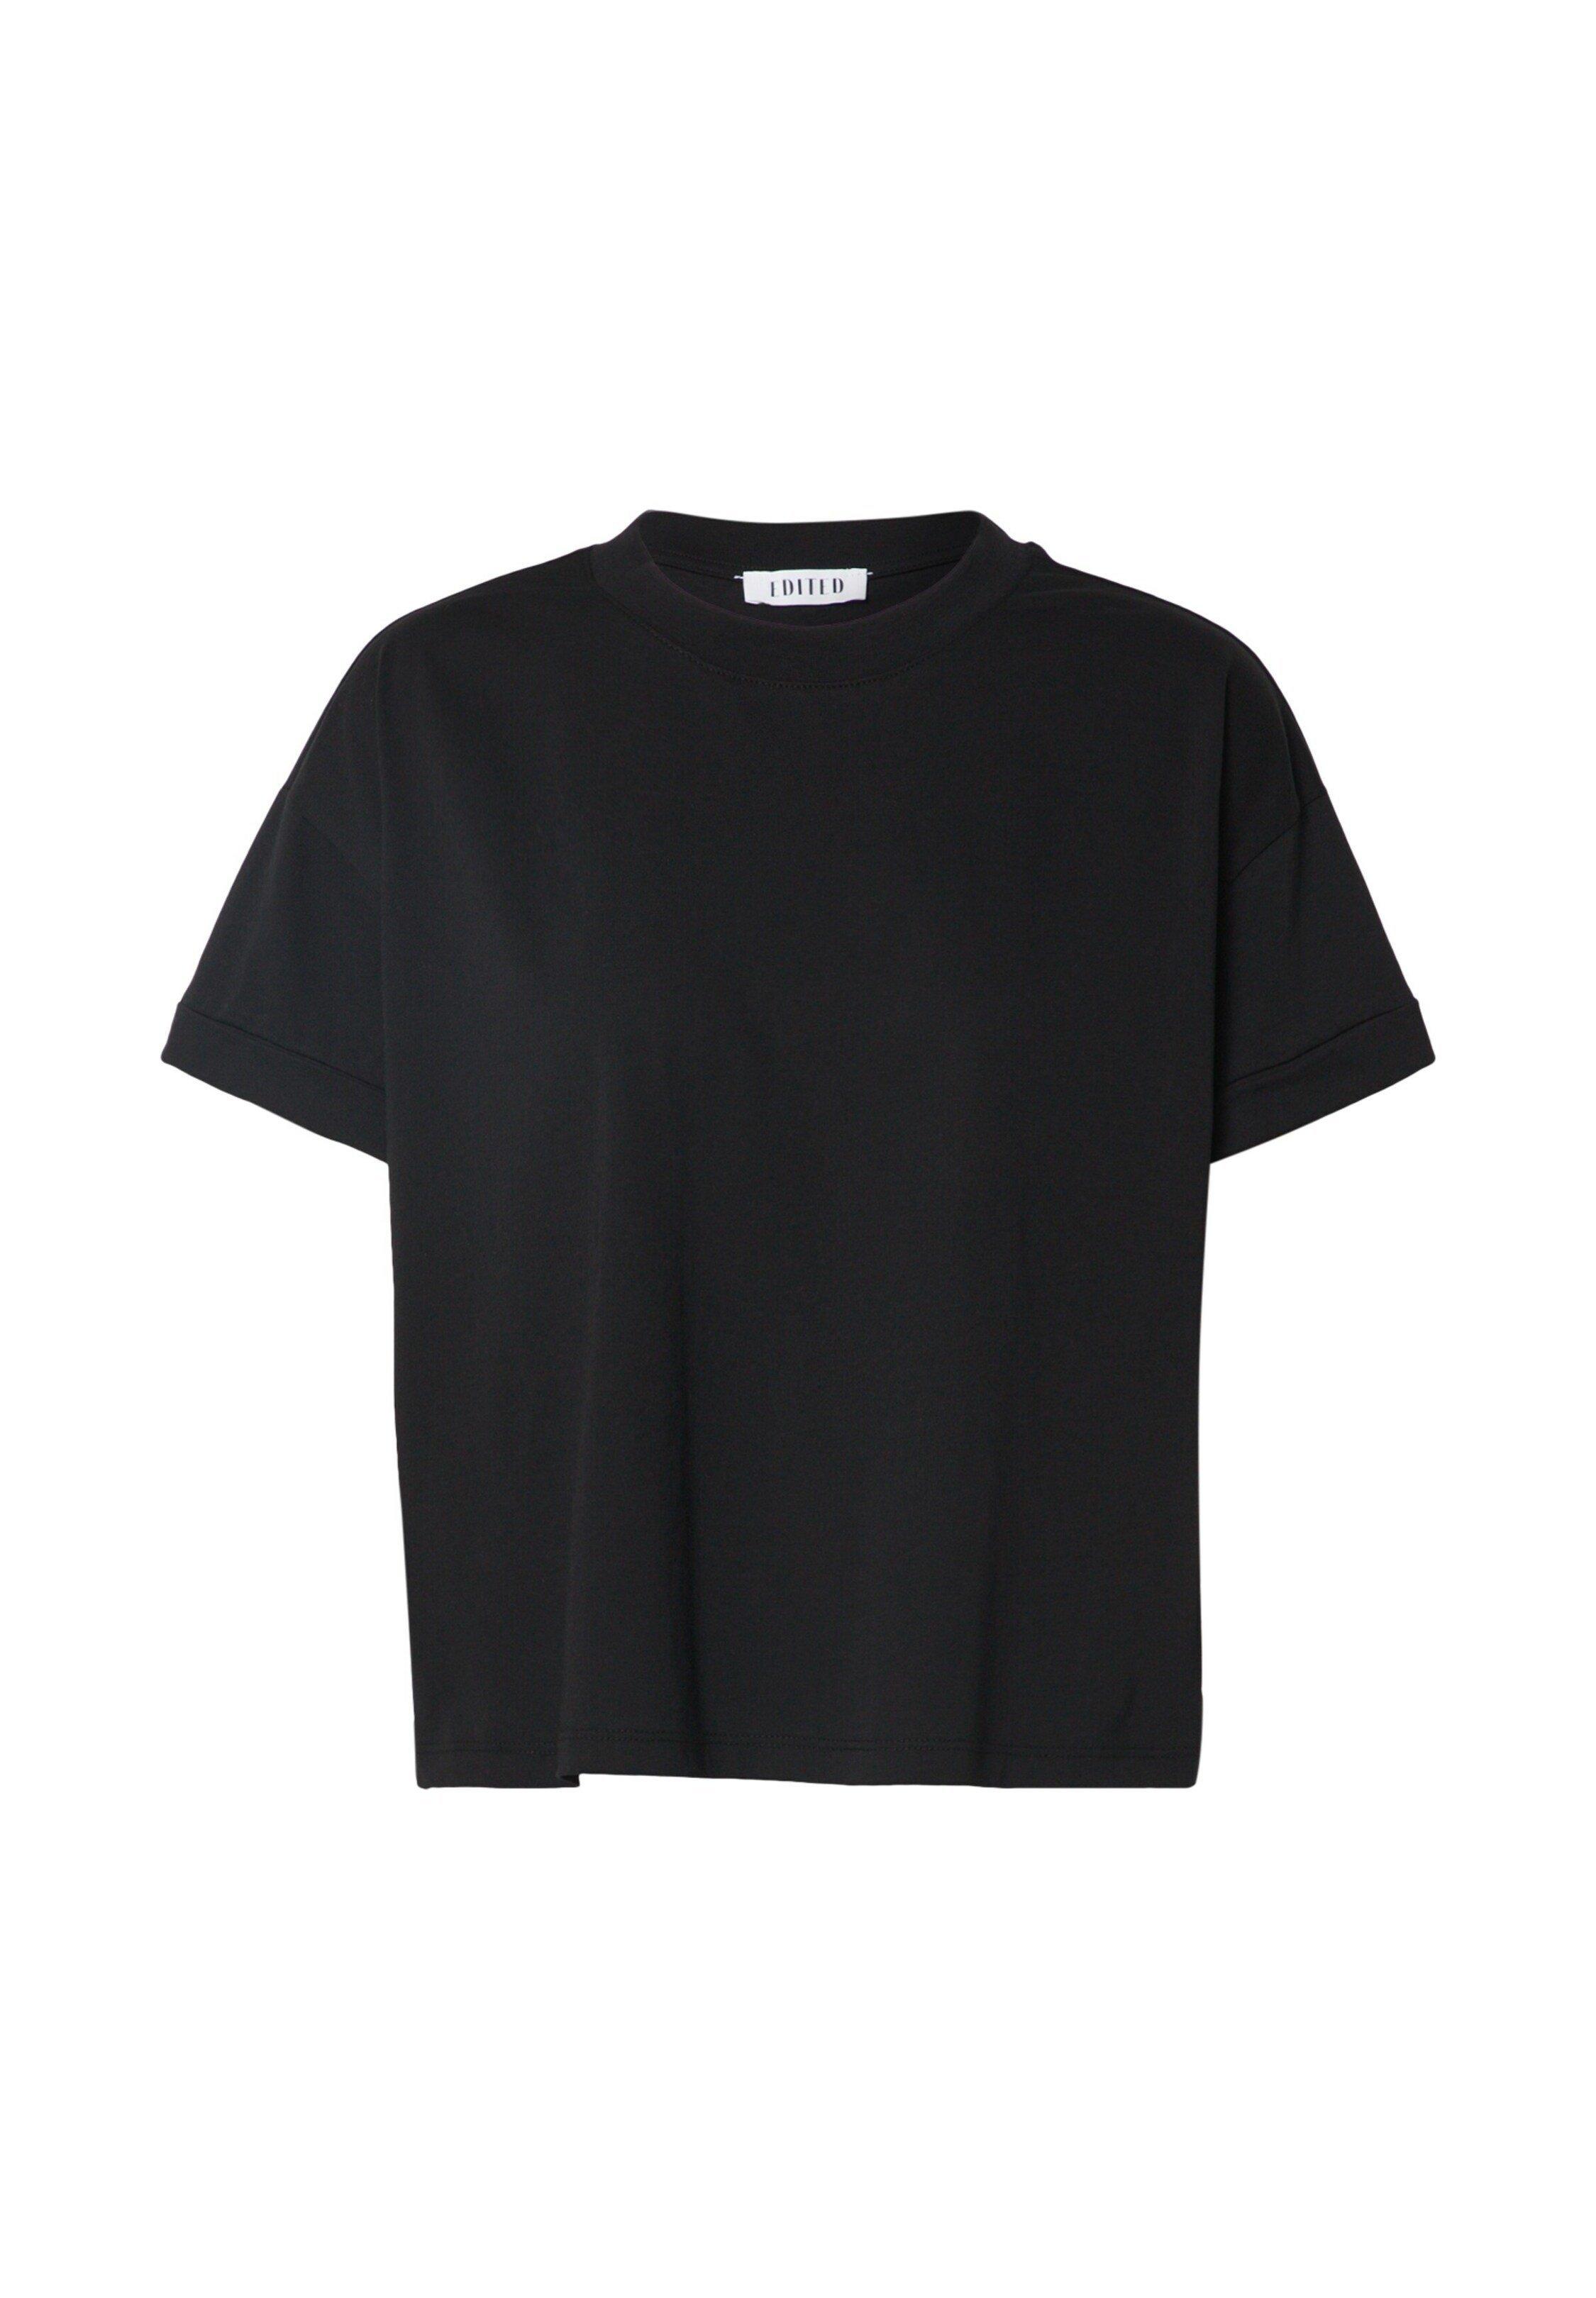 Edited Selena - T-shirts Black/svart